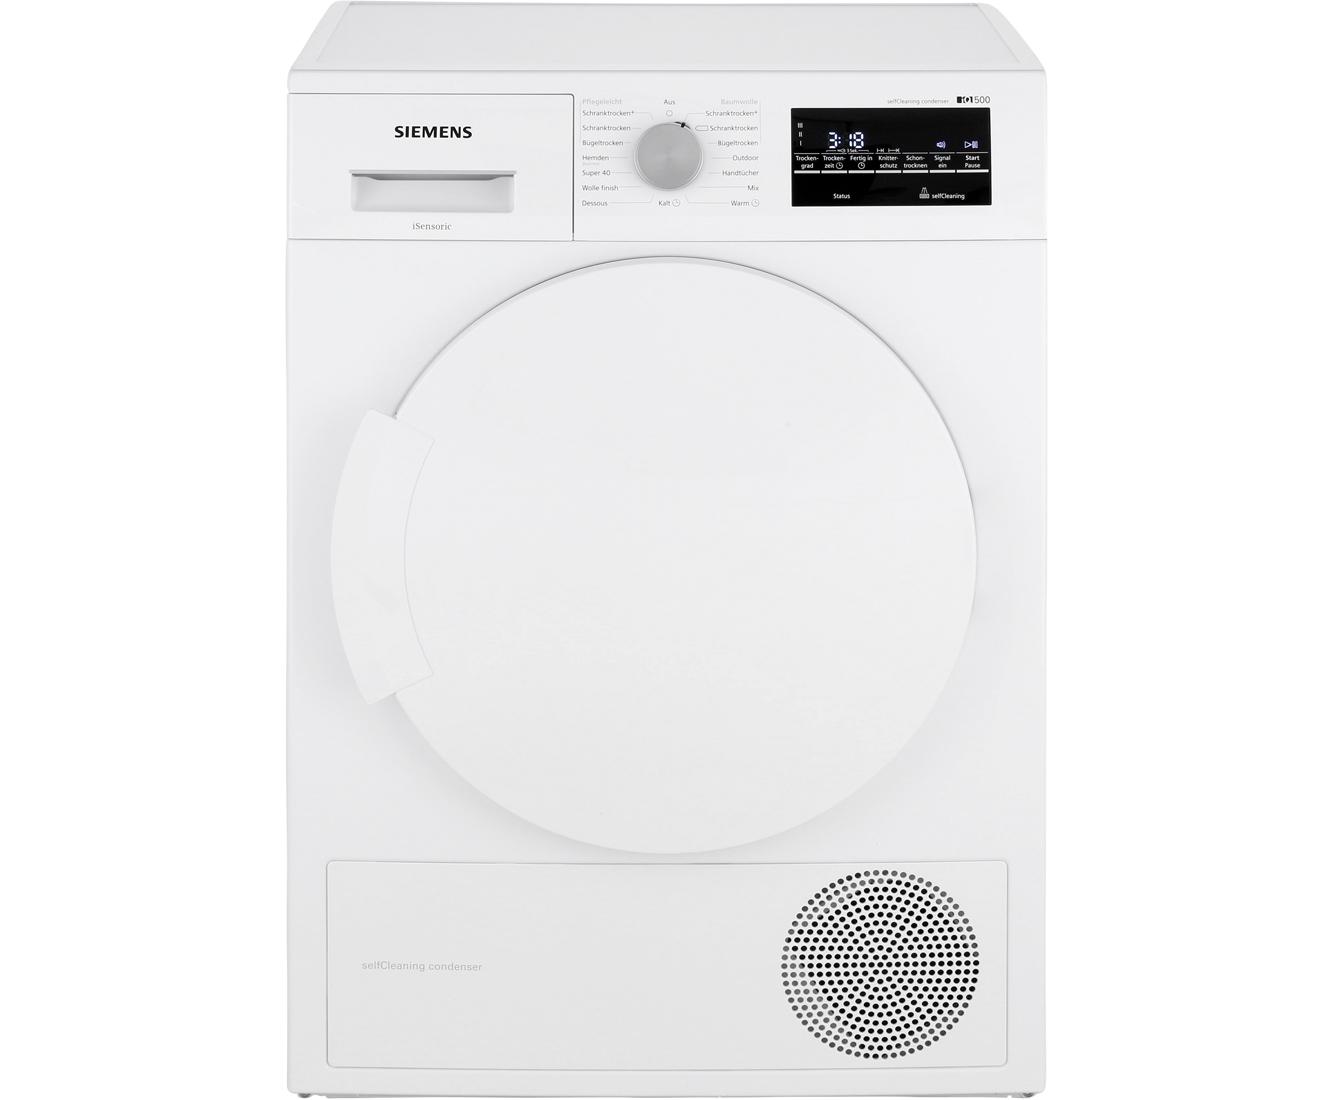 Siemens iq500 wt43w460 wärmepumpentrockner 7 kg weiß a